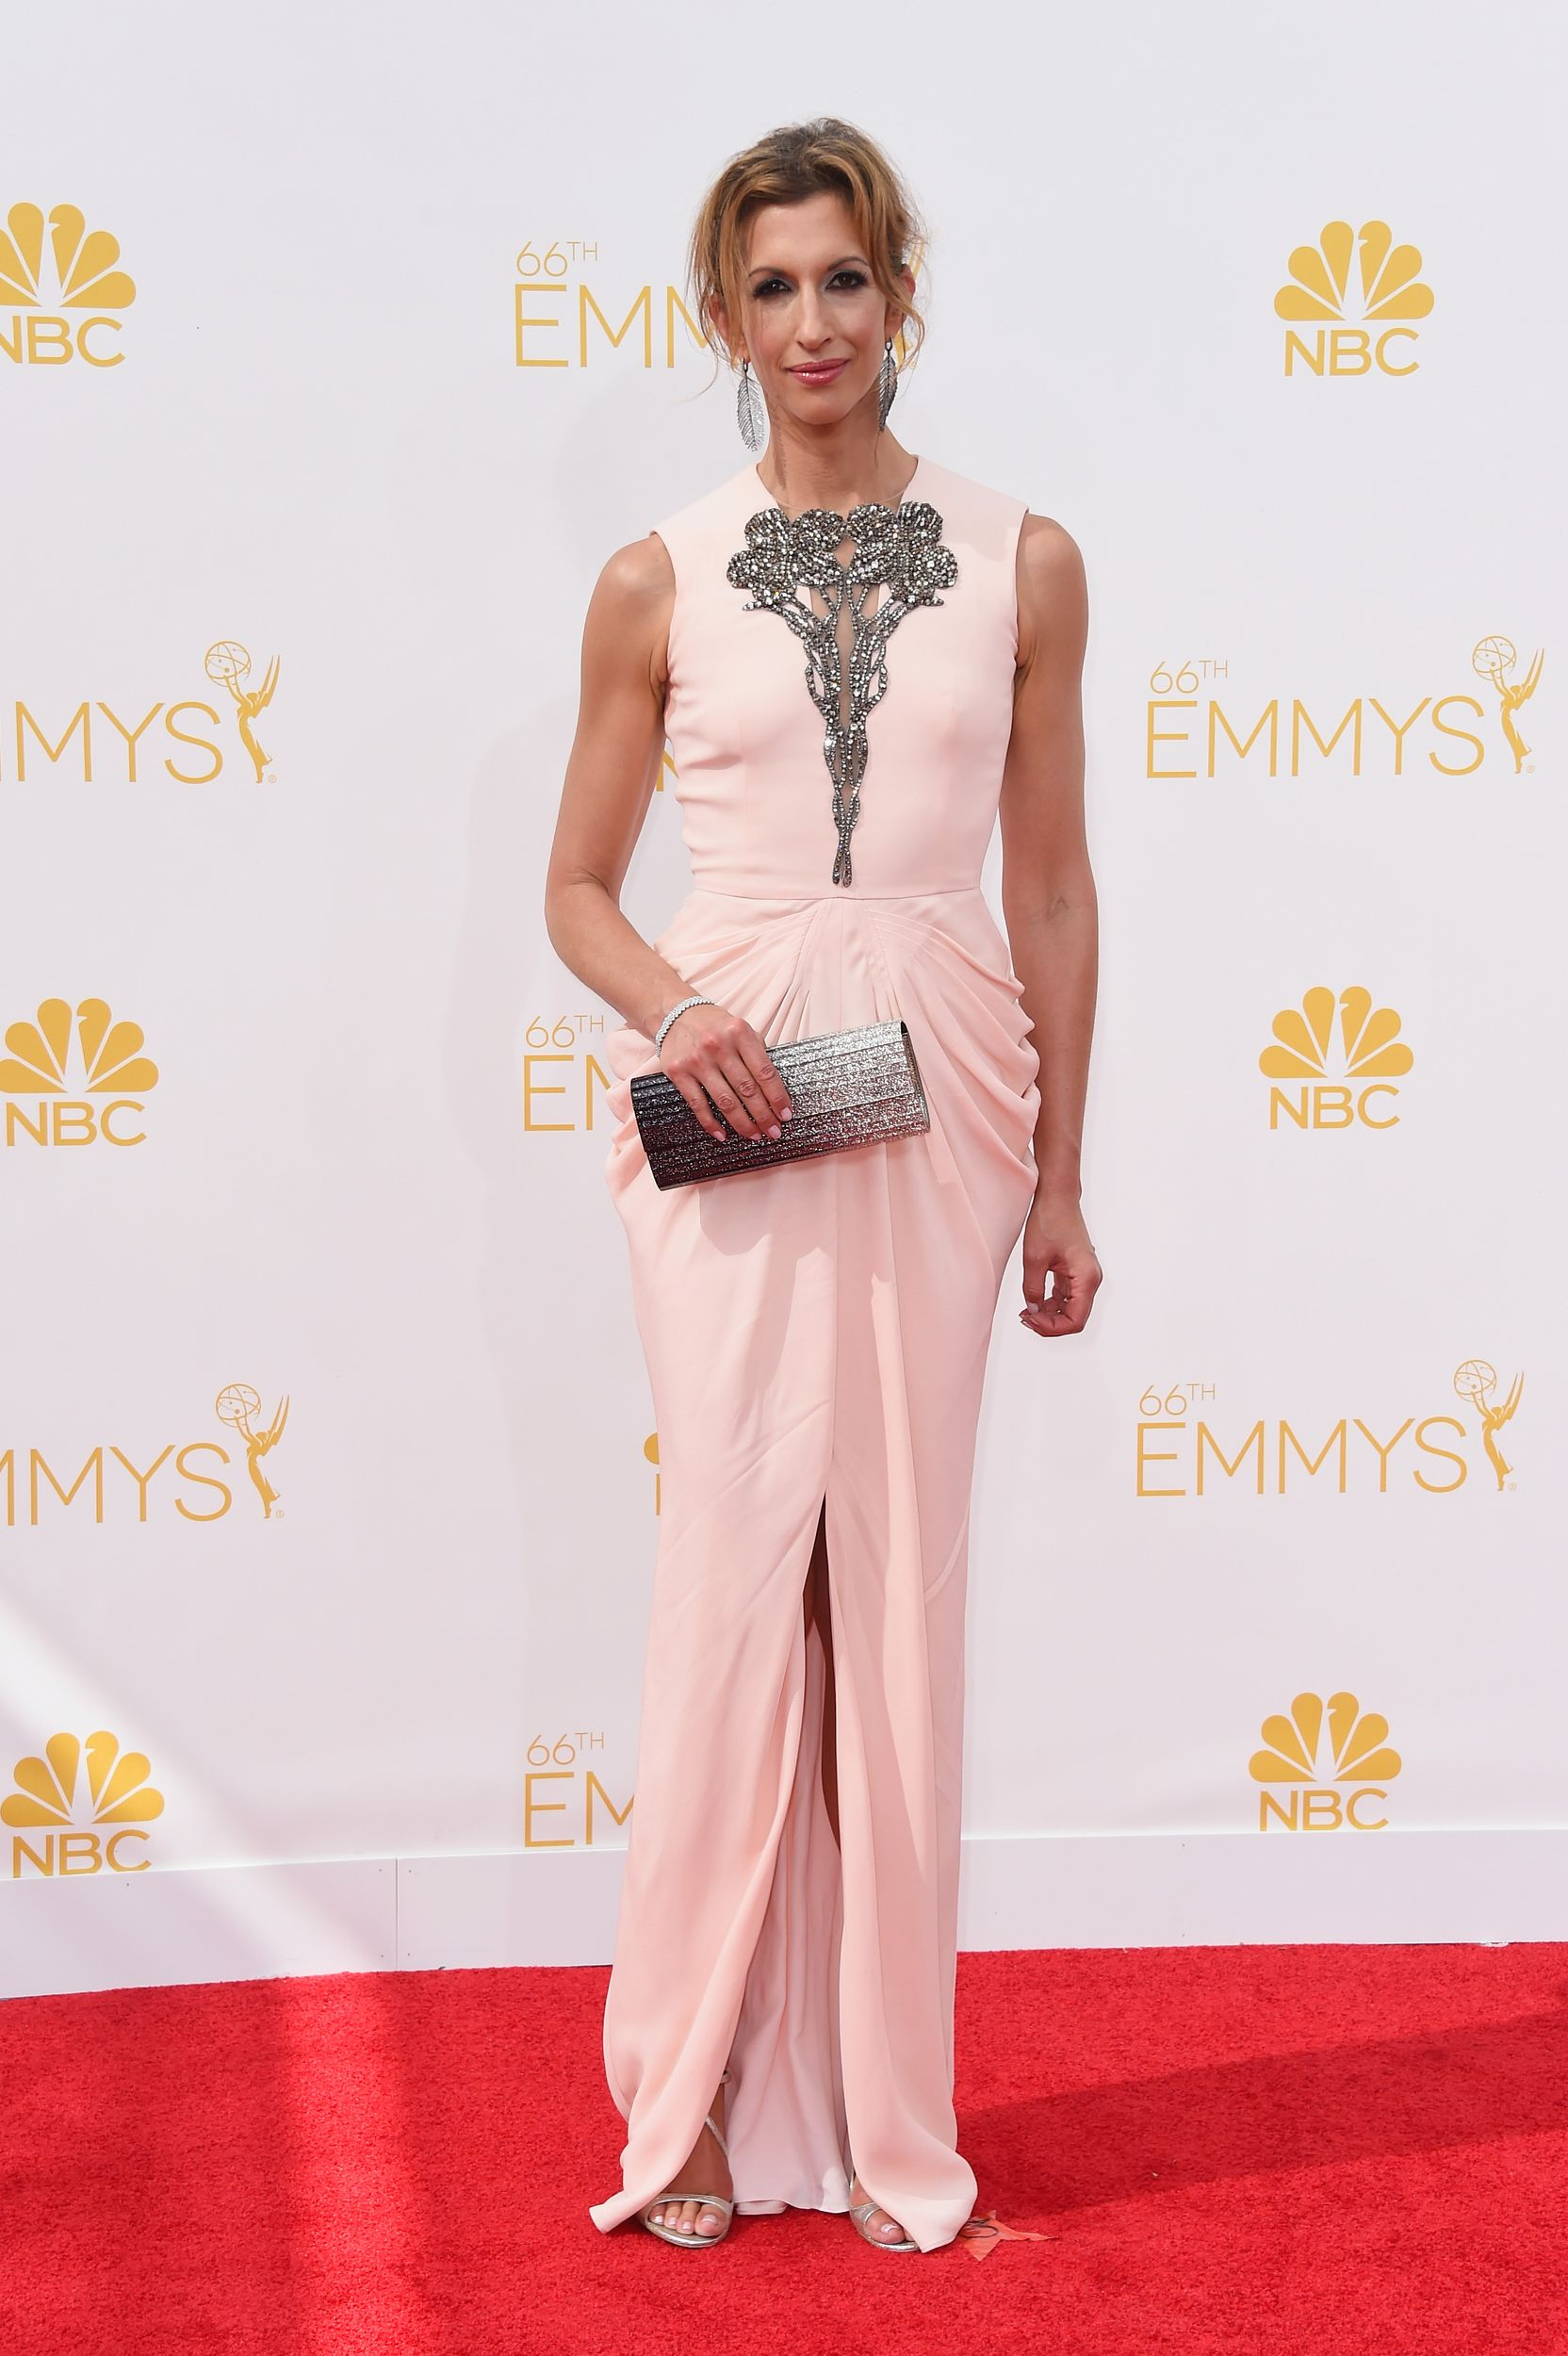 Red carpet arrivals at the 2014 Emmy Awards | Boda y Vestiditos